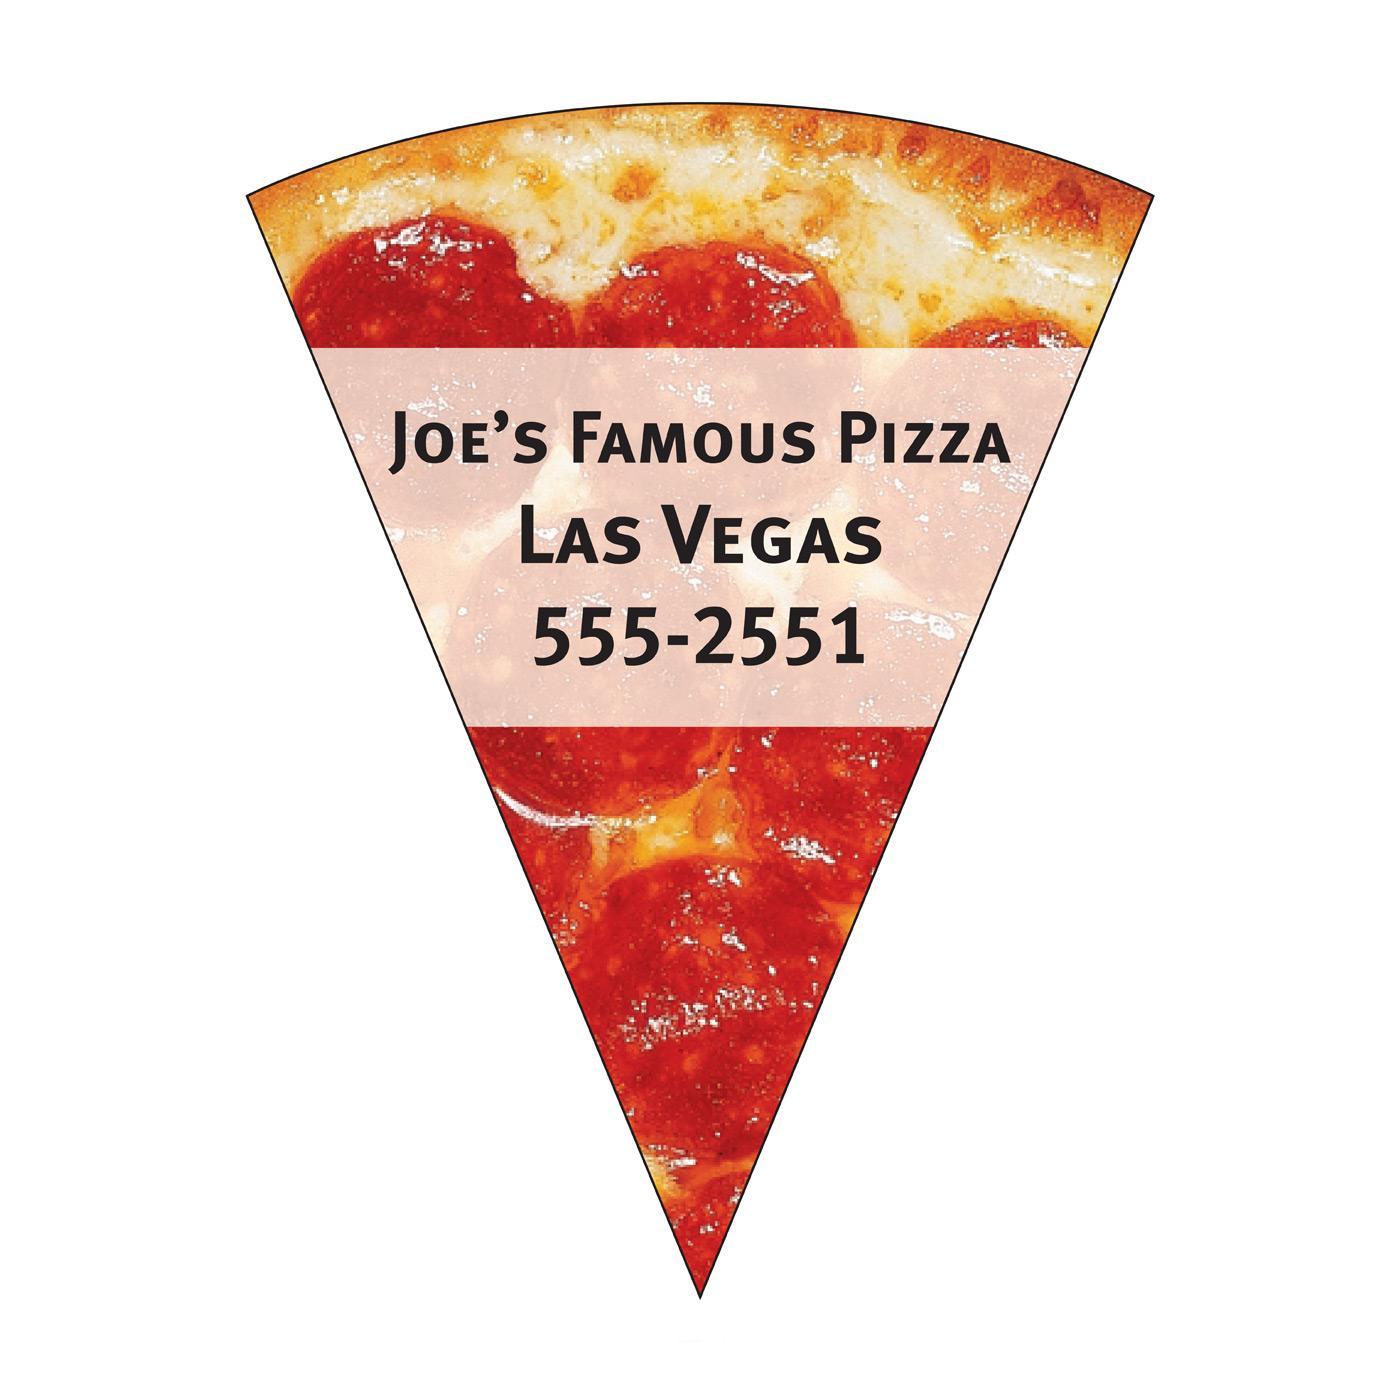 Pepperoni Pizza Slice Fridge Magnet